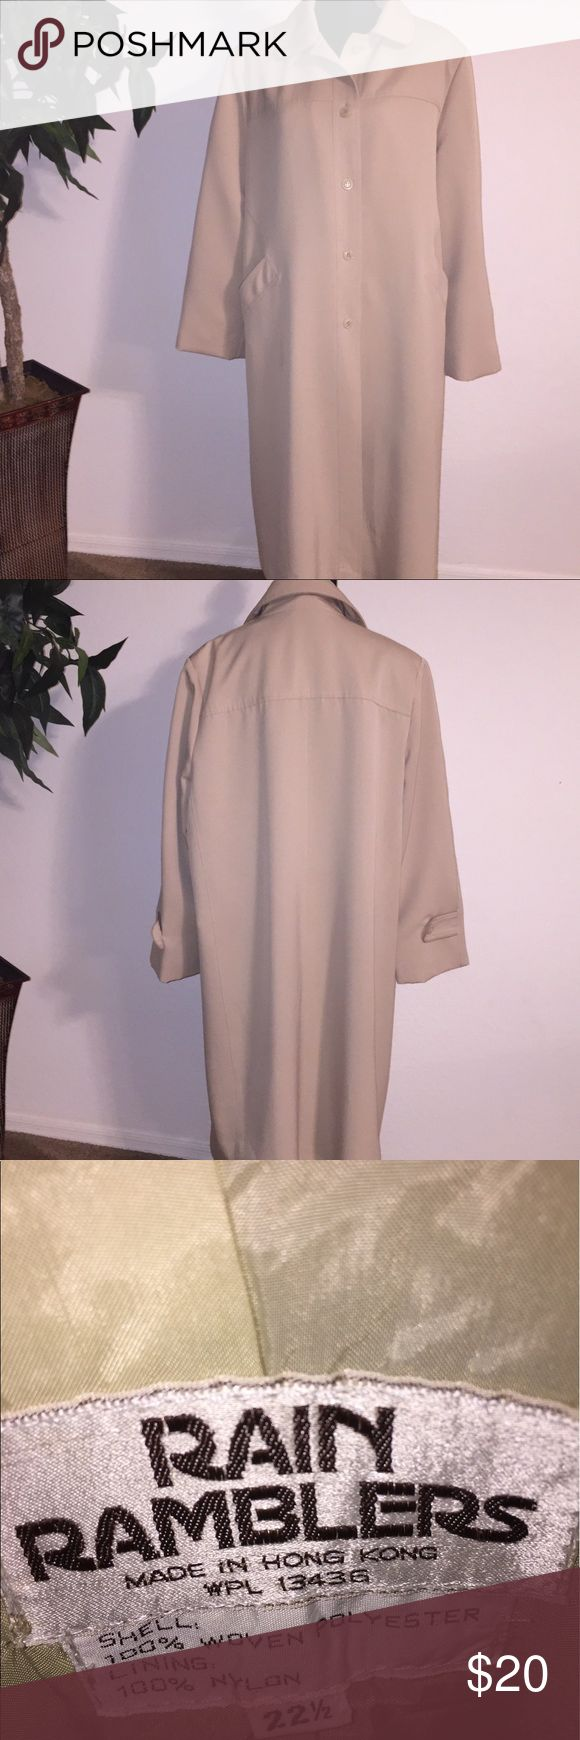 Rain Ramblers 22 W  tan trench rain coat Gently worn tan Rain Ramblers. Women's 22 plus size. Fully lined and 2 side pockets. Rain Ramblers Jackets & Coats Trench Coats